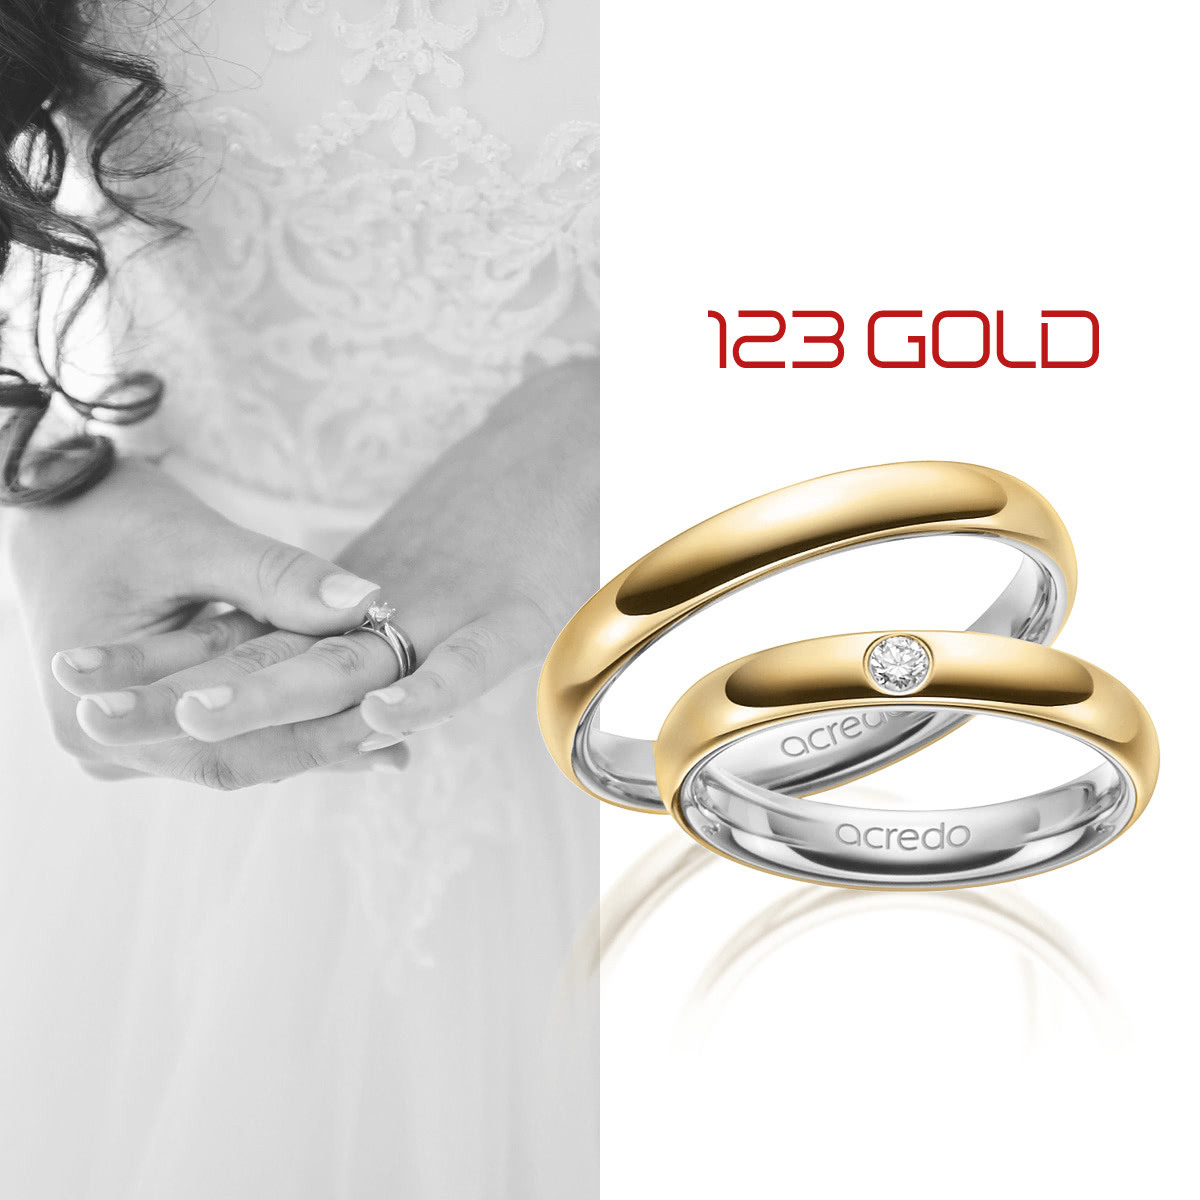 Trauringe/eheringe Gold | Katalog Trauringe/eheringe 123Gold